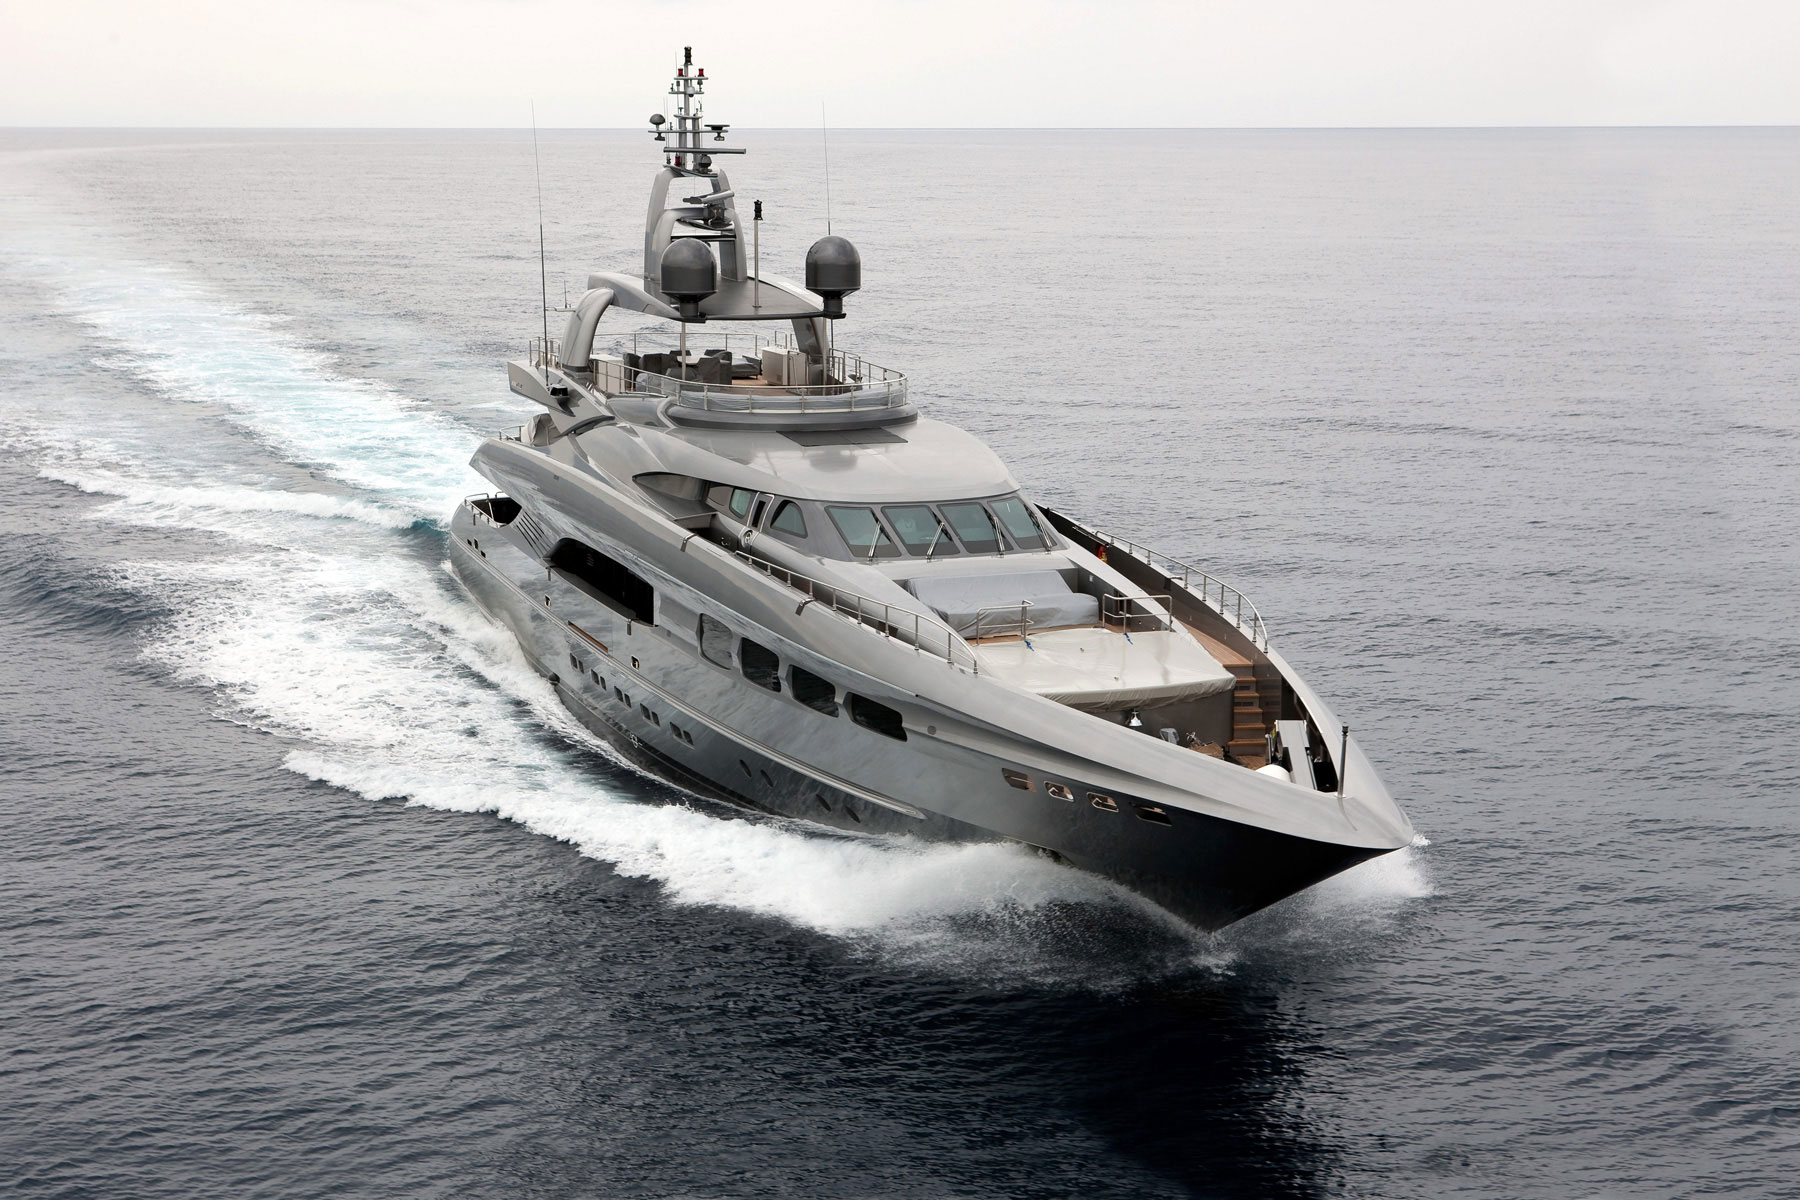 AUSPICIOUS Yacht Charter Details Mondomarine  : Luxury20motor20yacht20Streamline20by20Mondo20Marine from www.charterworld.com size 1800 x 1200 jpeg 429kB